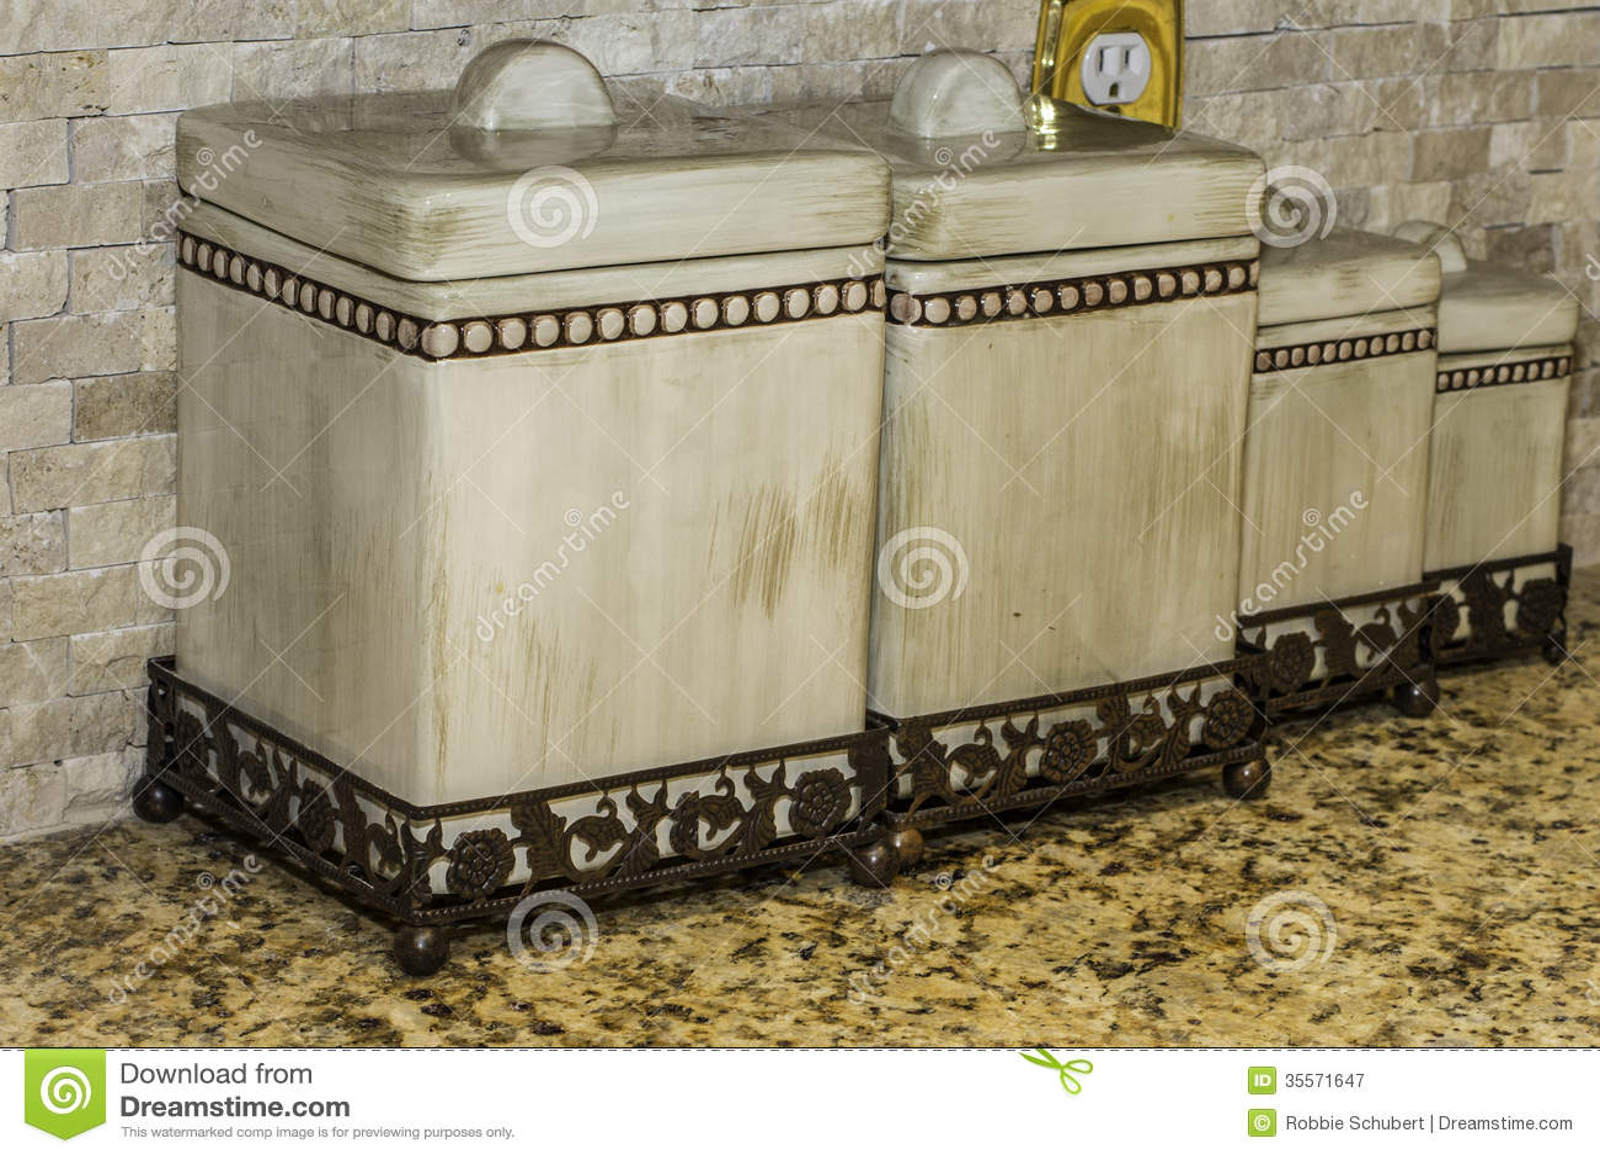 ceramic kitchen top cabinet designs in india 厨房罐库存图片 图片包括有厨具 玻璃 对象 器物 盒盖 容器 bothy 厨房罐